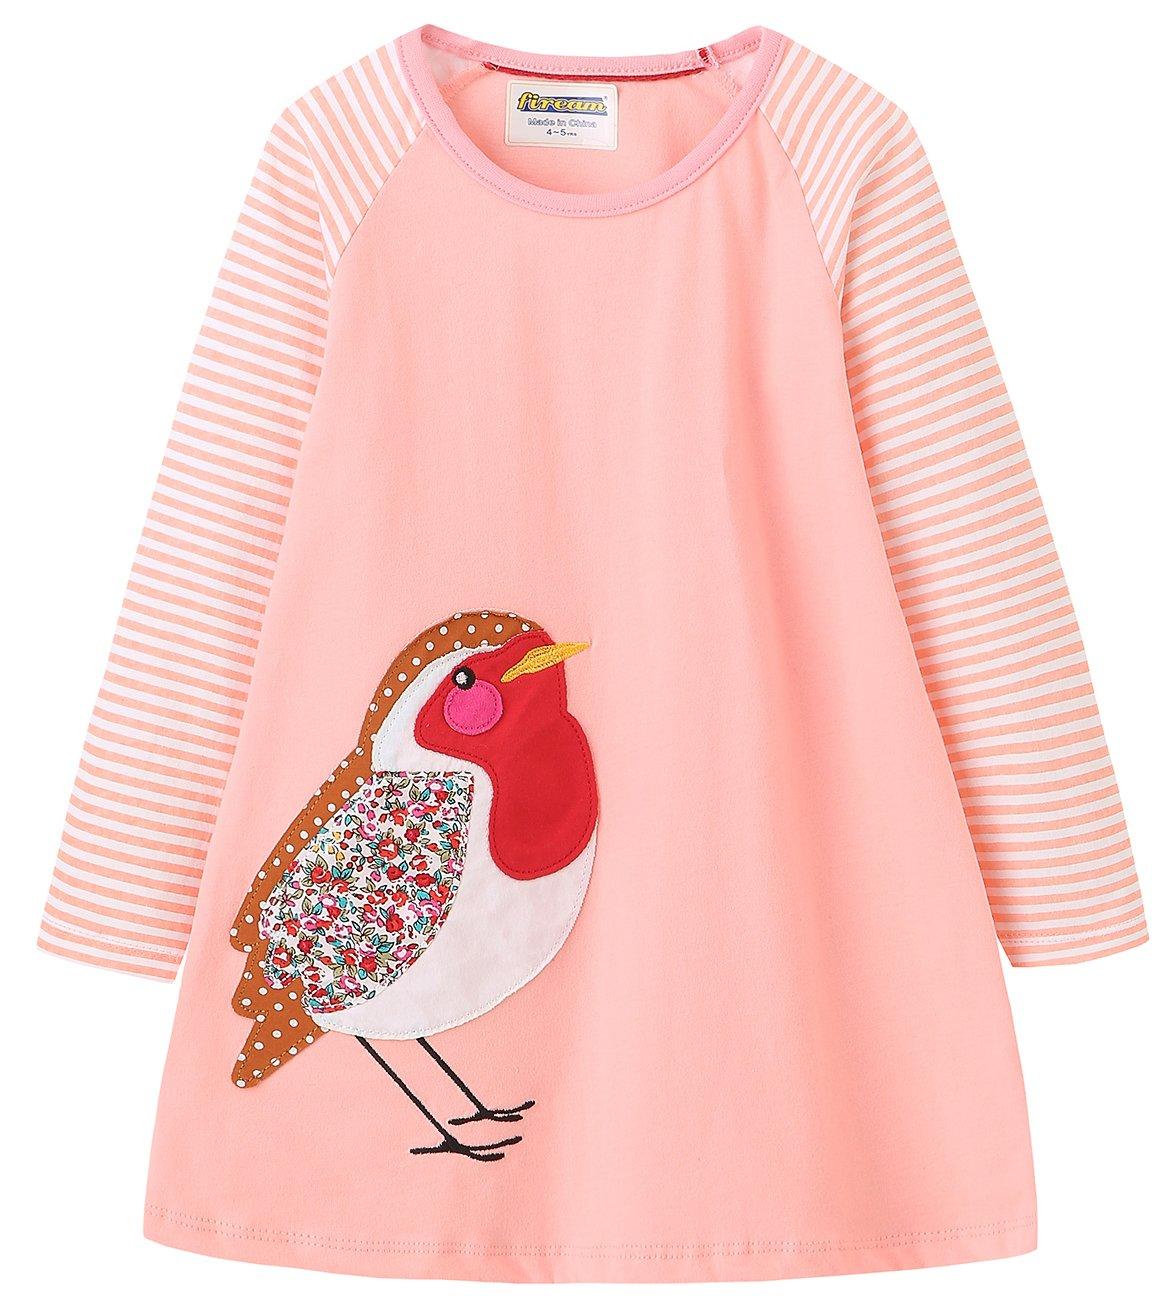 Fiream Girls Applique Cotton Casual Longsleeve Cartoon Dresses(7631TZ,9-10 Years)